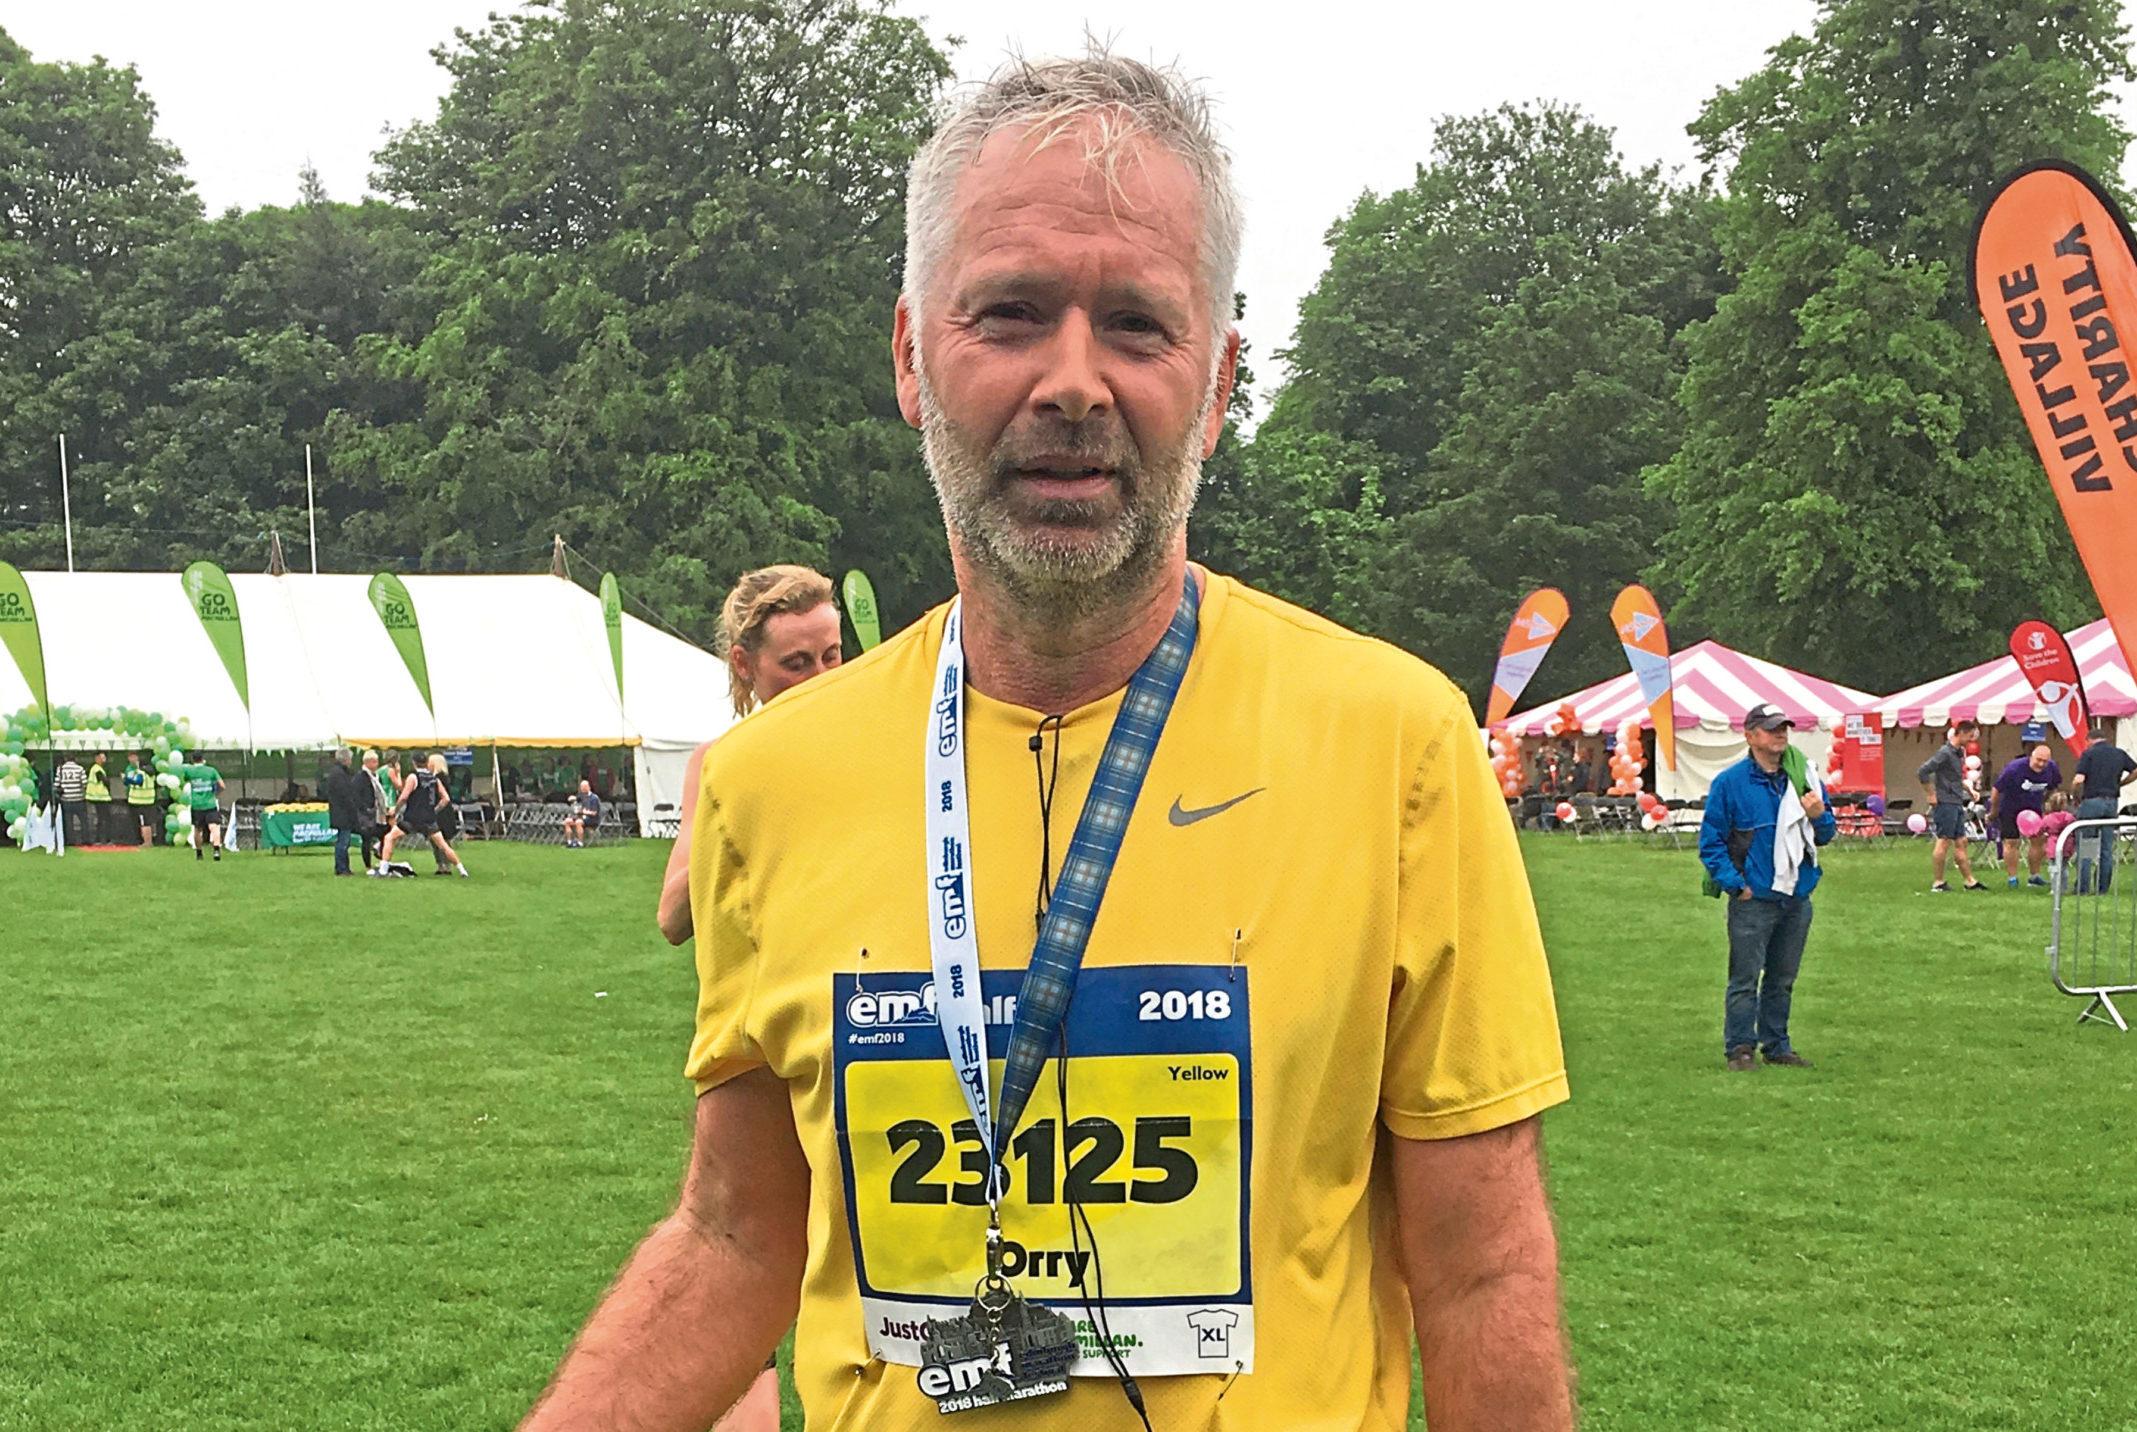 Retired pipe fitter Orry Nowosad after the Edinburgh Half Marathon